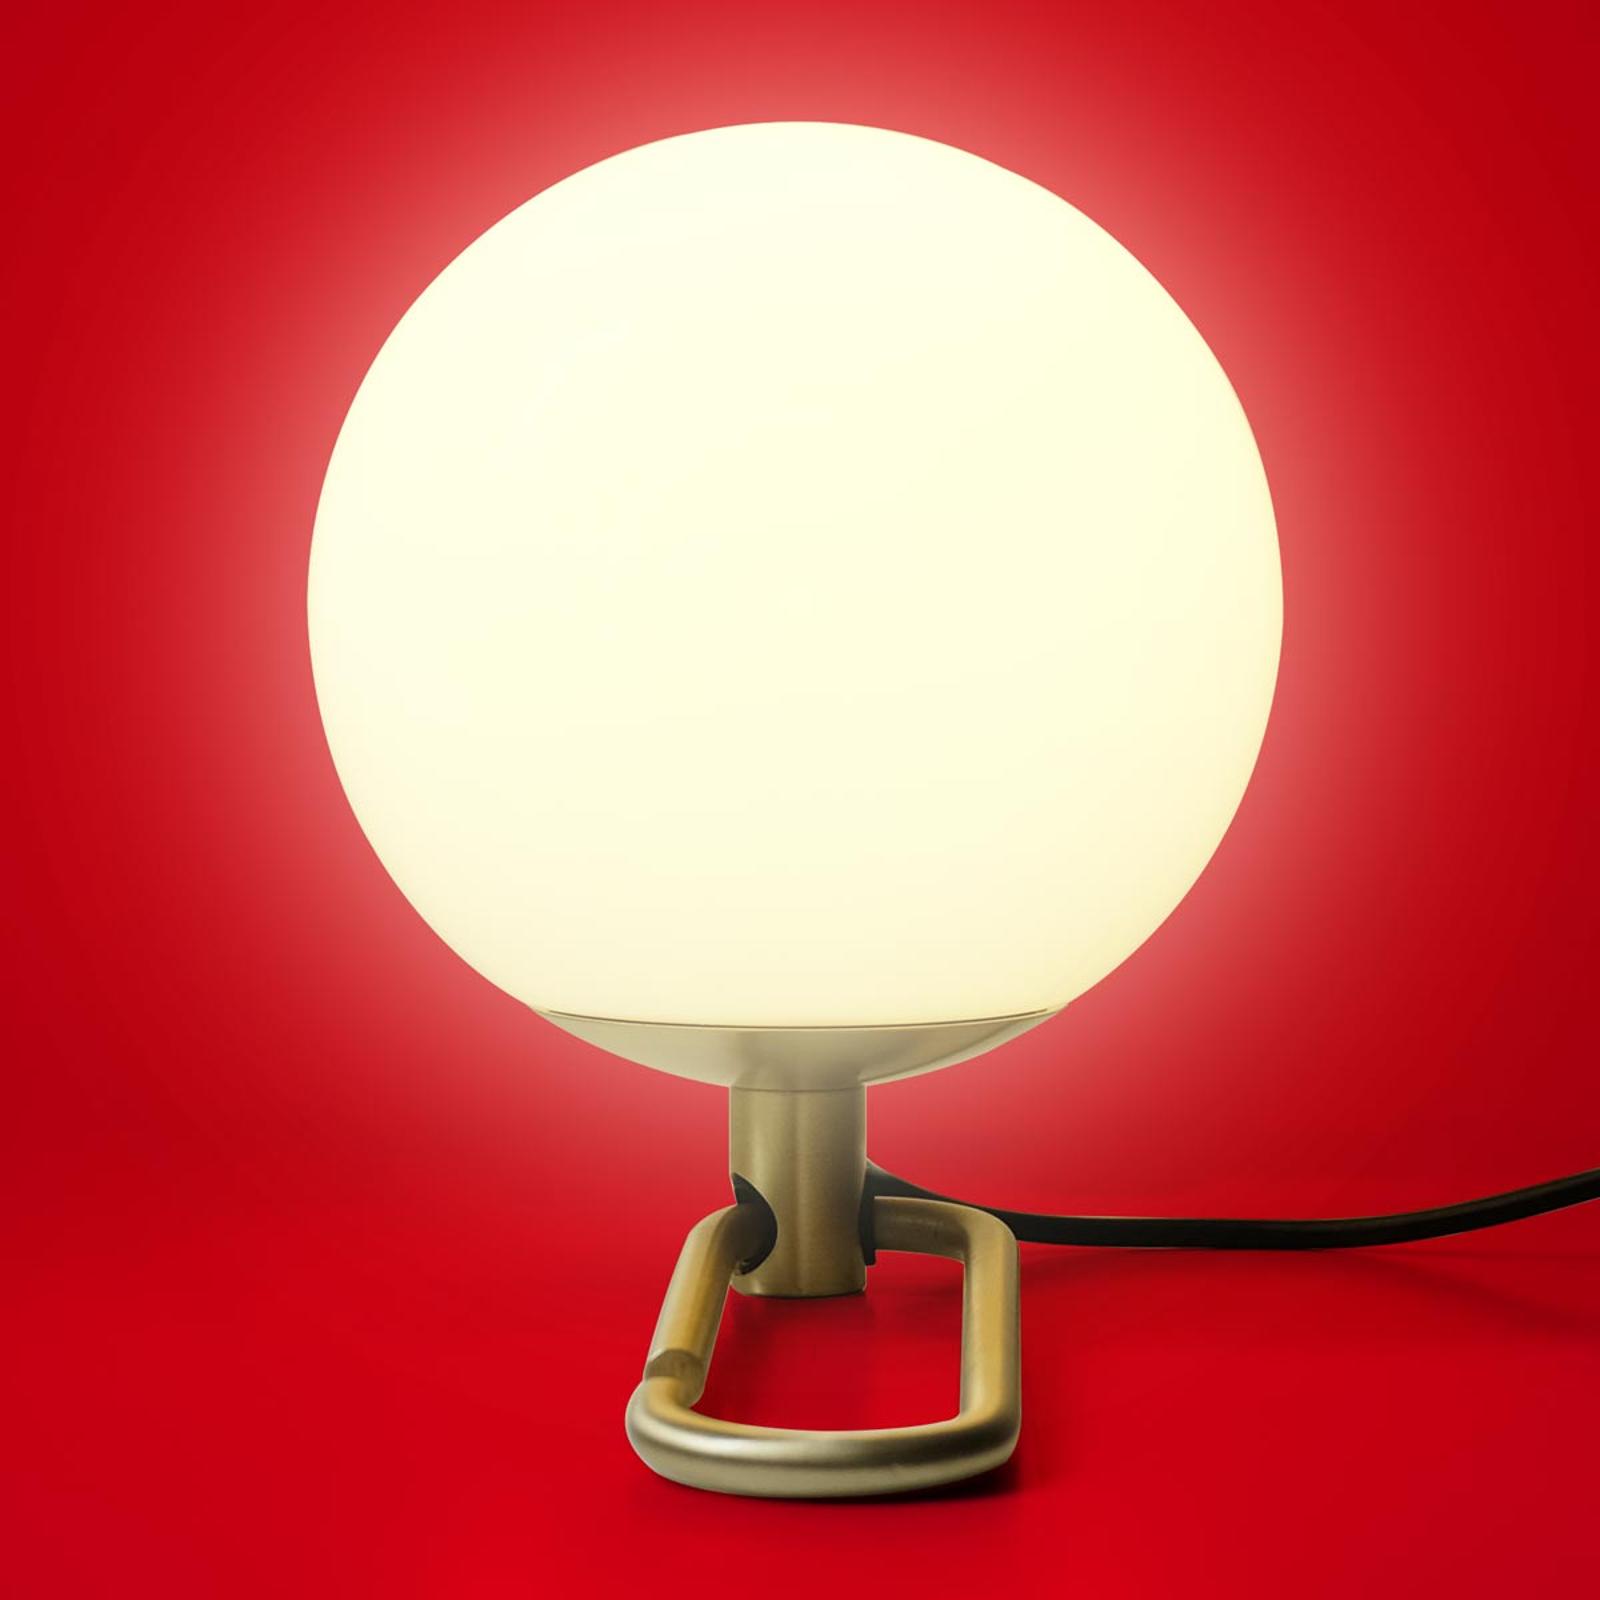 Lámpara de mesa LED nh1217de gran versatilidad